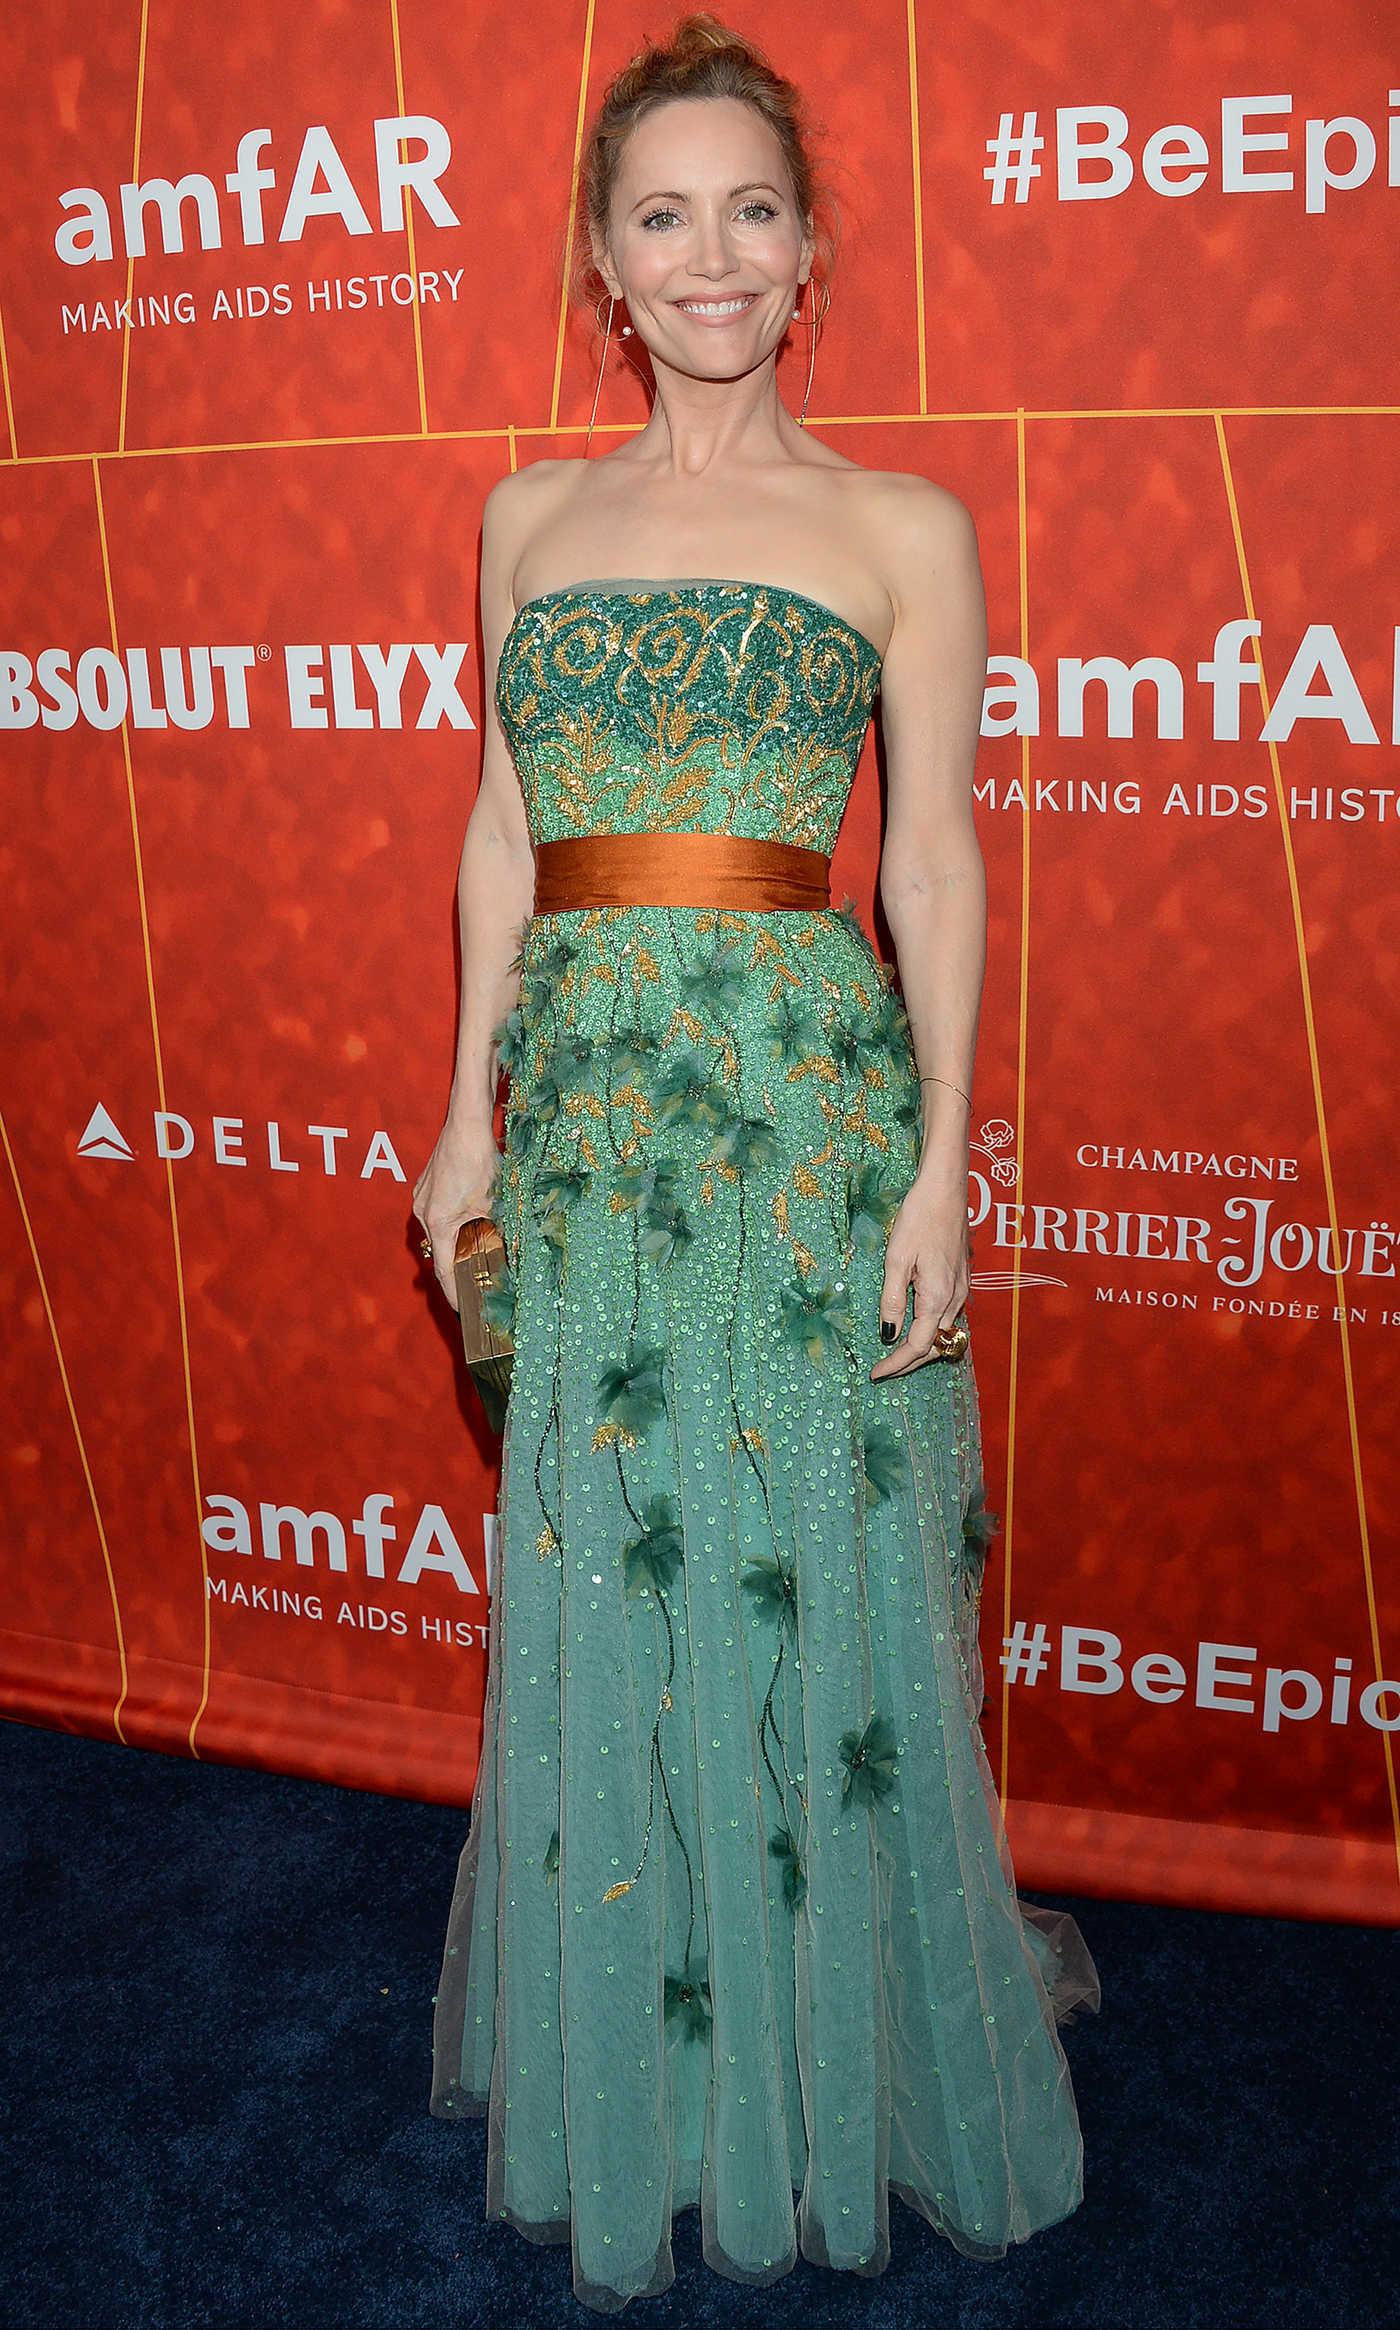 Leslie Mann Attends amfAR Gala in Beverly Hills 10/18/2018